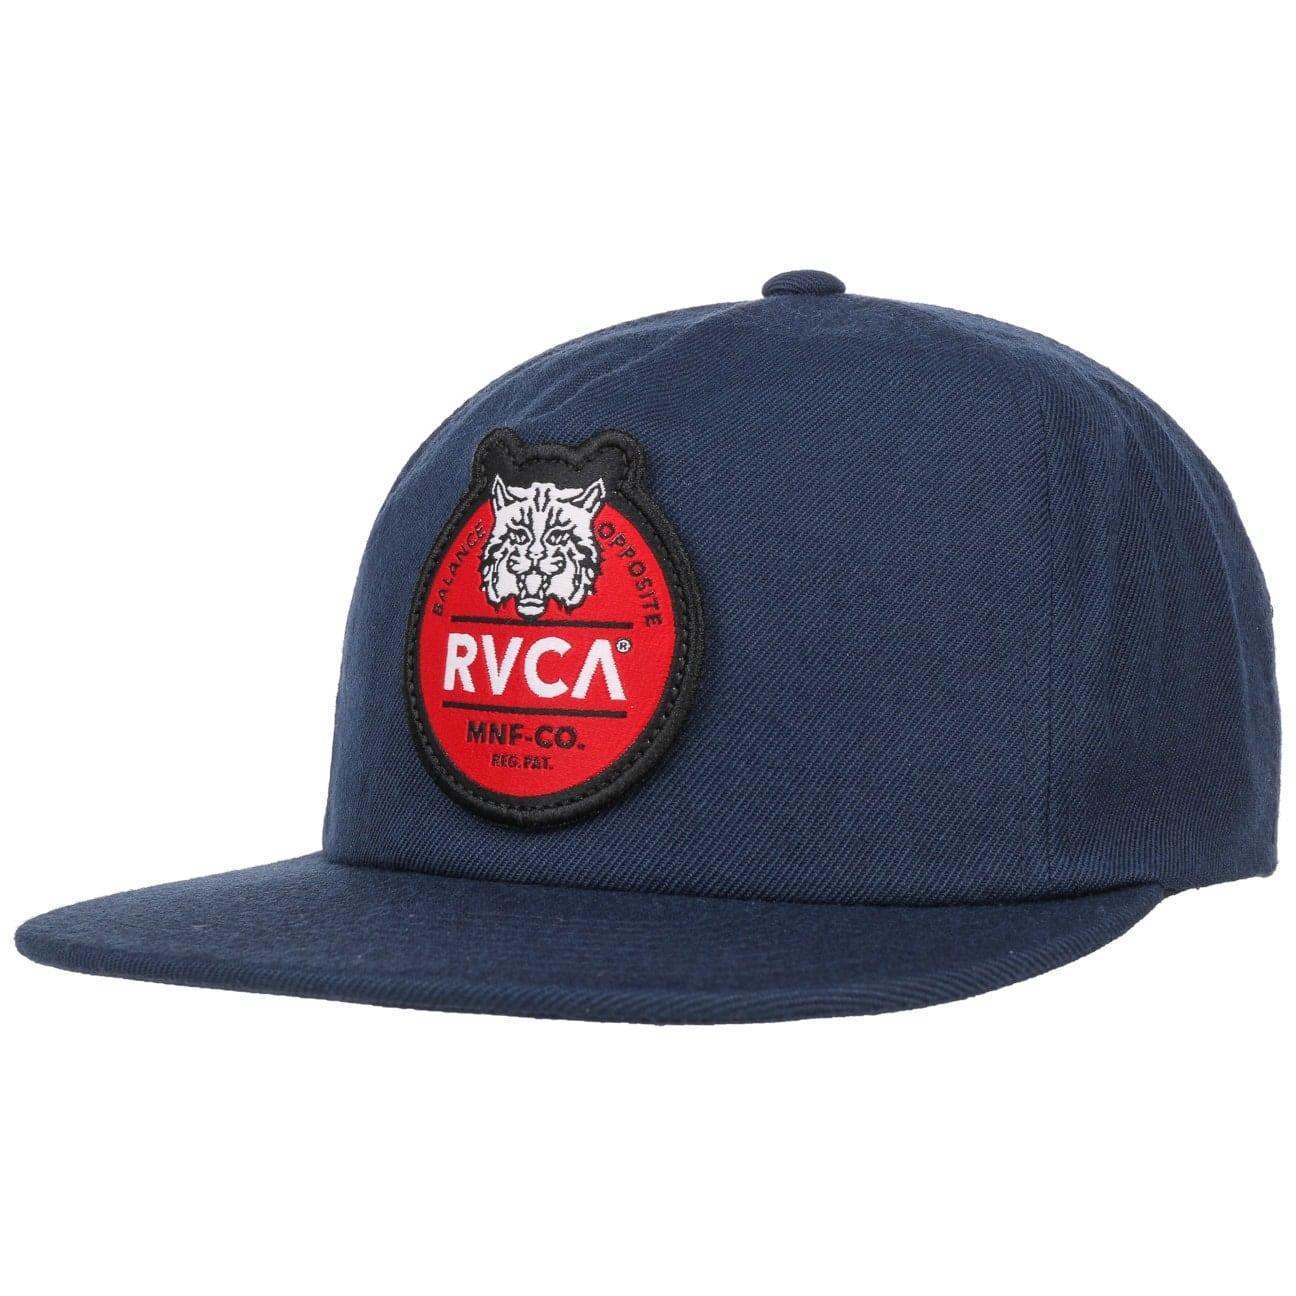 Gorra Snapback Balance Opposite by RVCA